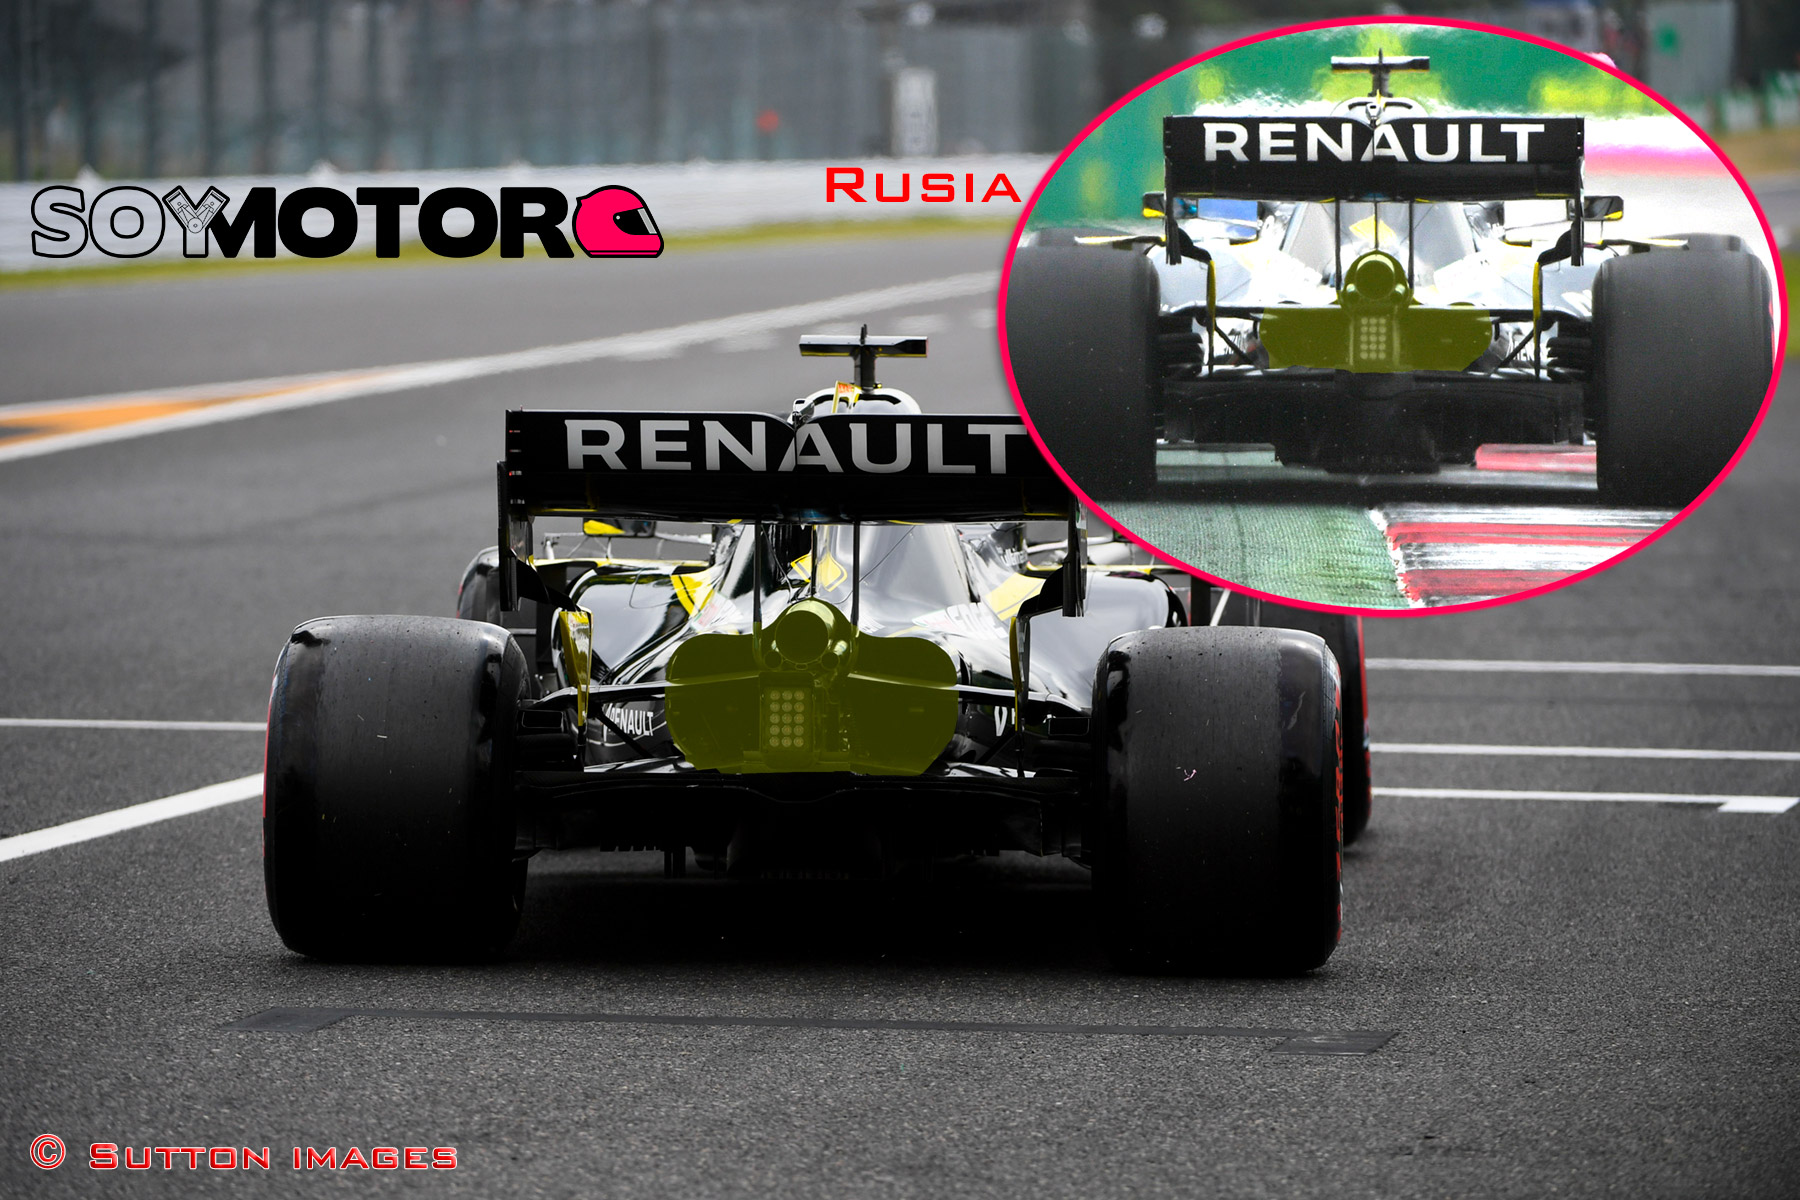 renault-salida-posterior-soymotor_1.jpg